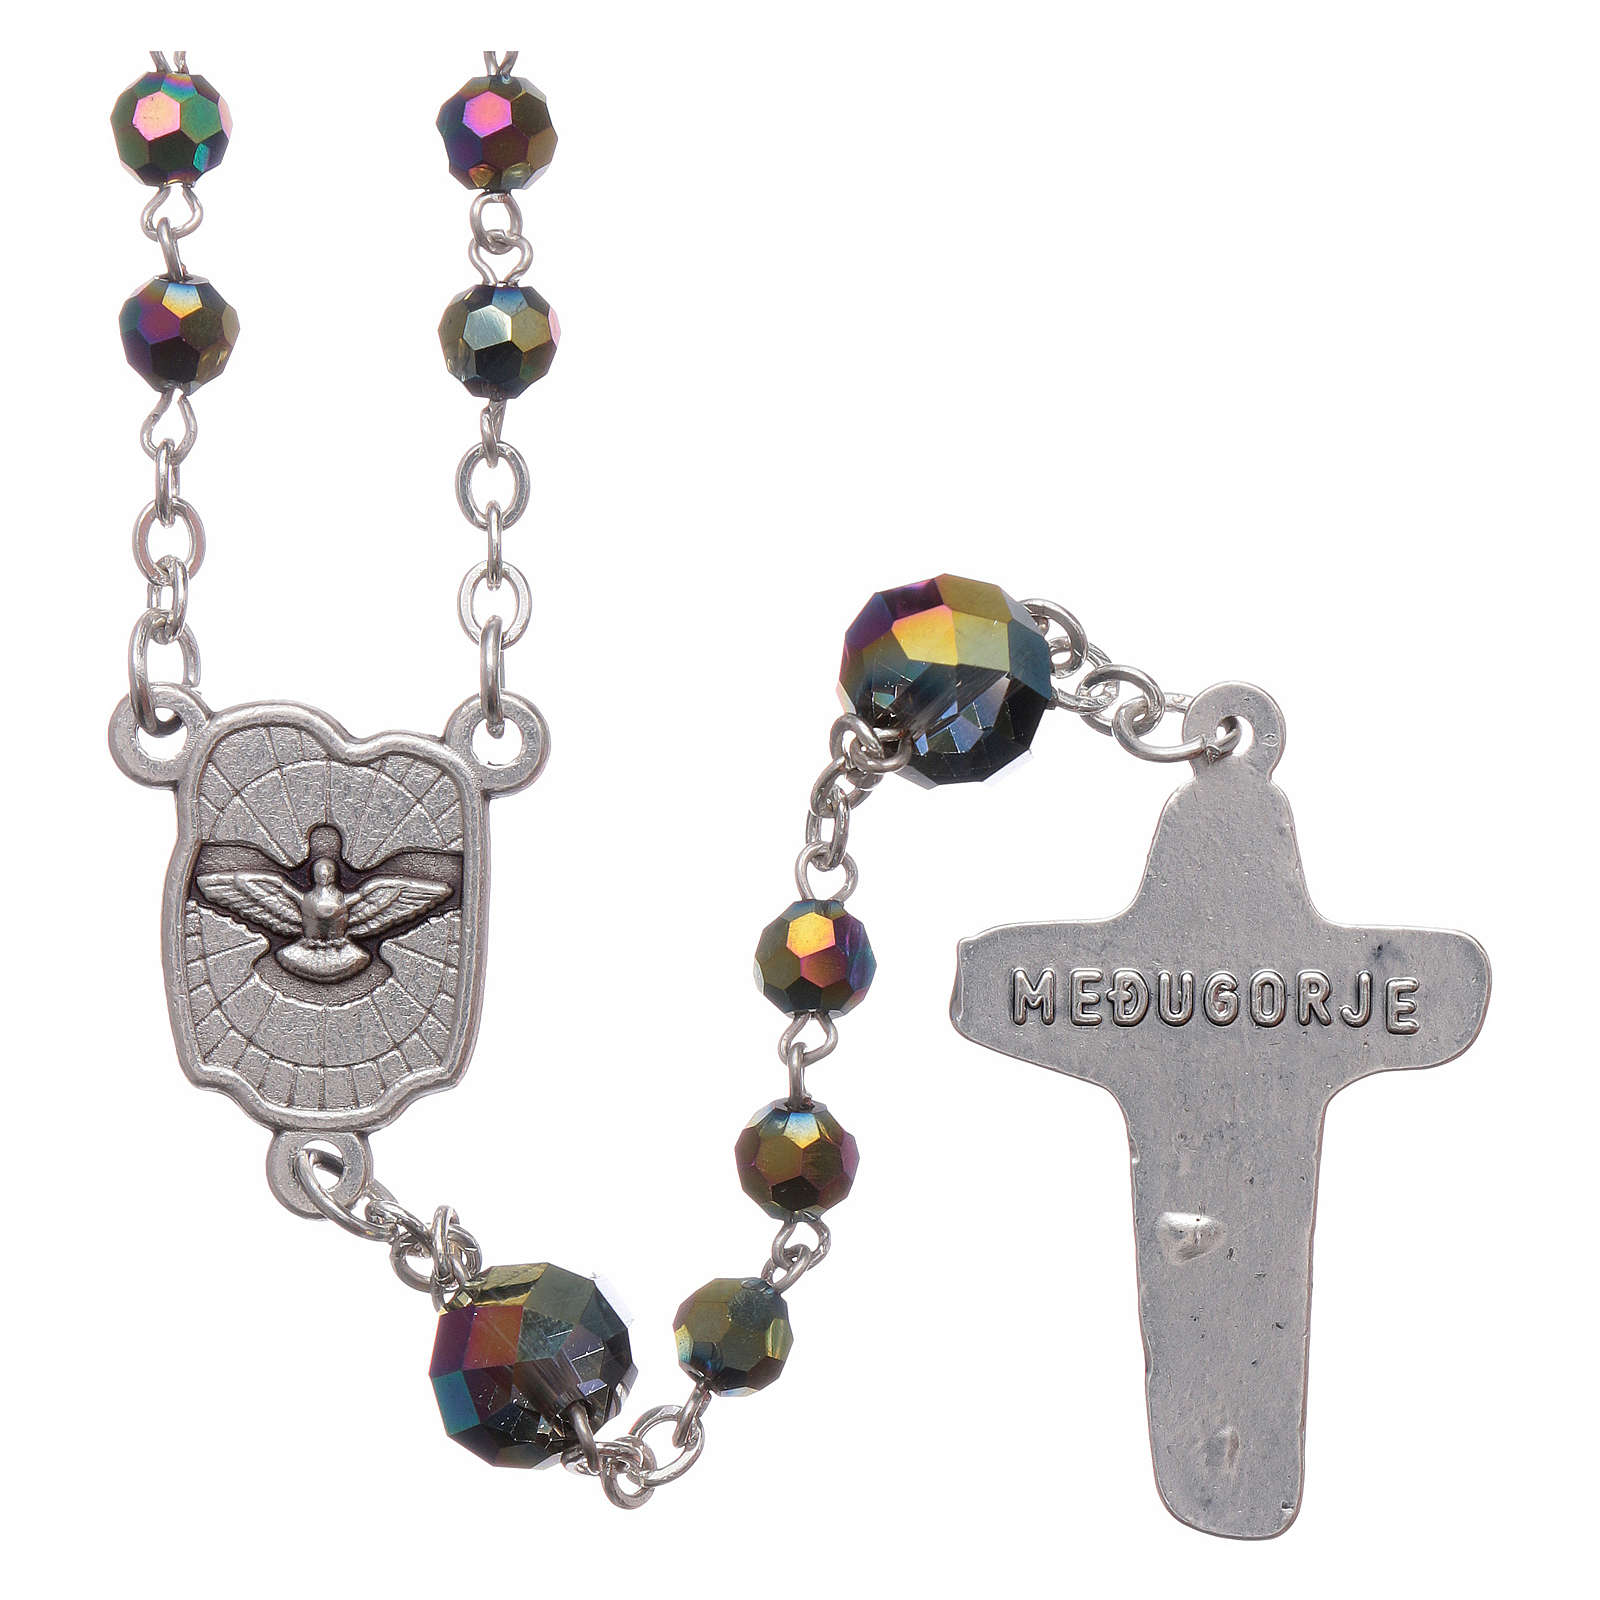 Rosario collar Medjugorje cristal iridescente 4 mm 4